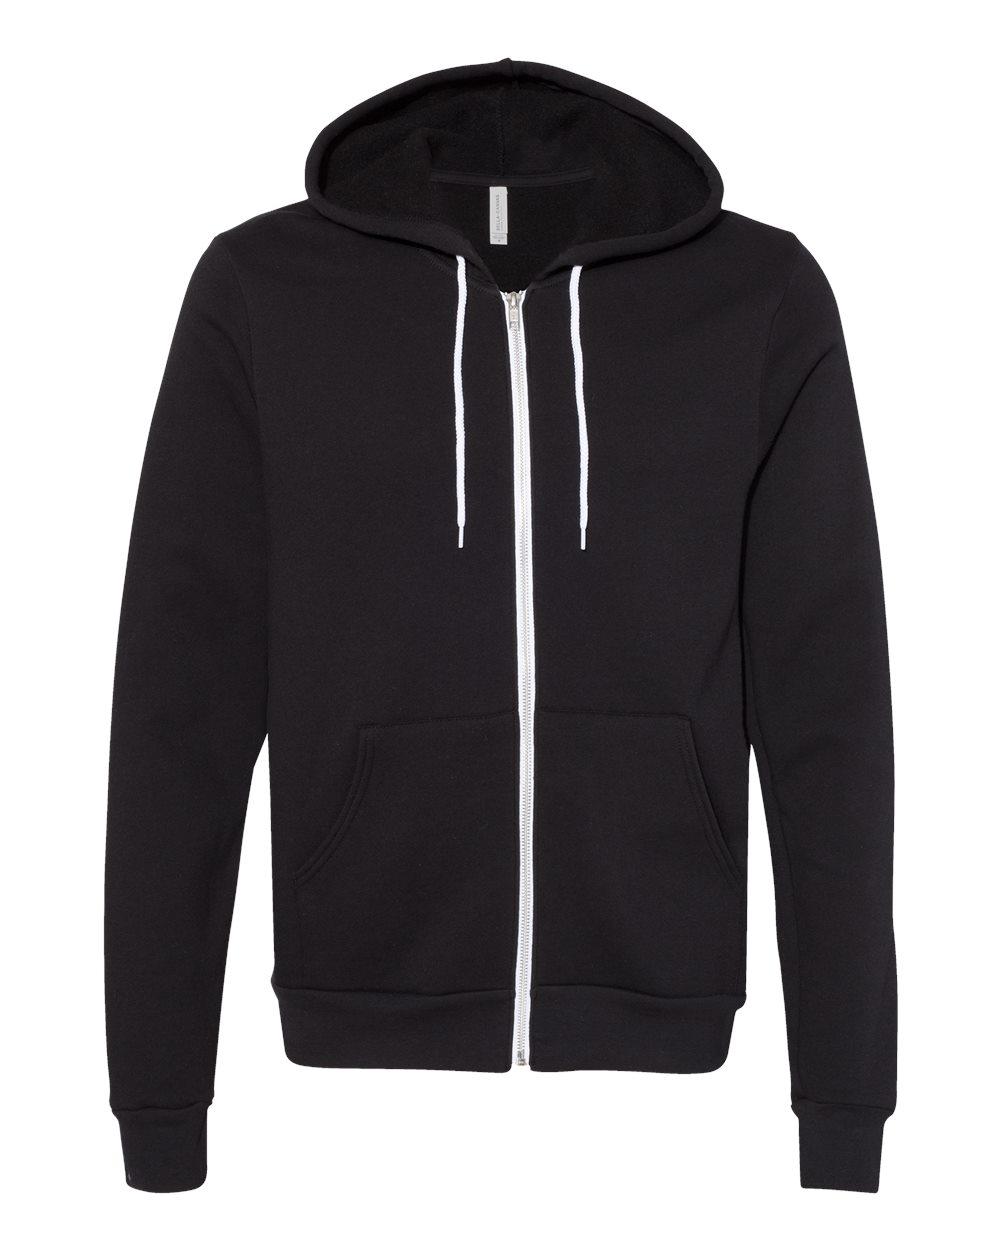 Bella-Canvas-Unisex-Full-Zip-Up-Hooded-Sweatshirt-Blank-Hoodie-3739-up-to-3XL thumbnail 24